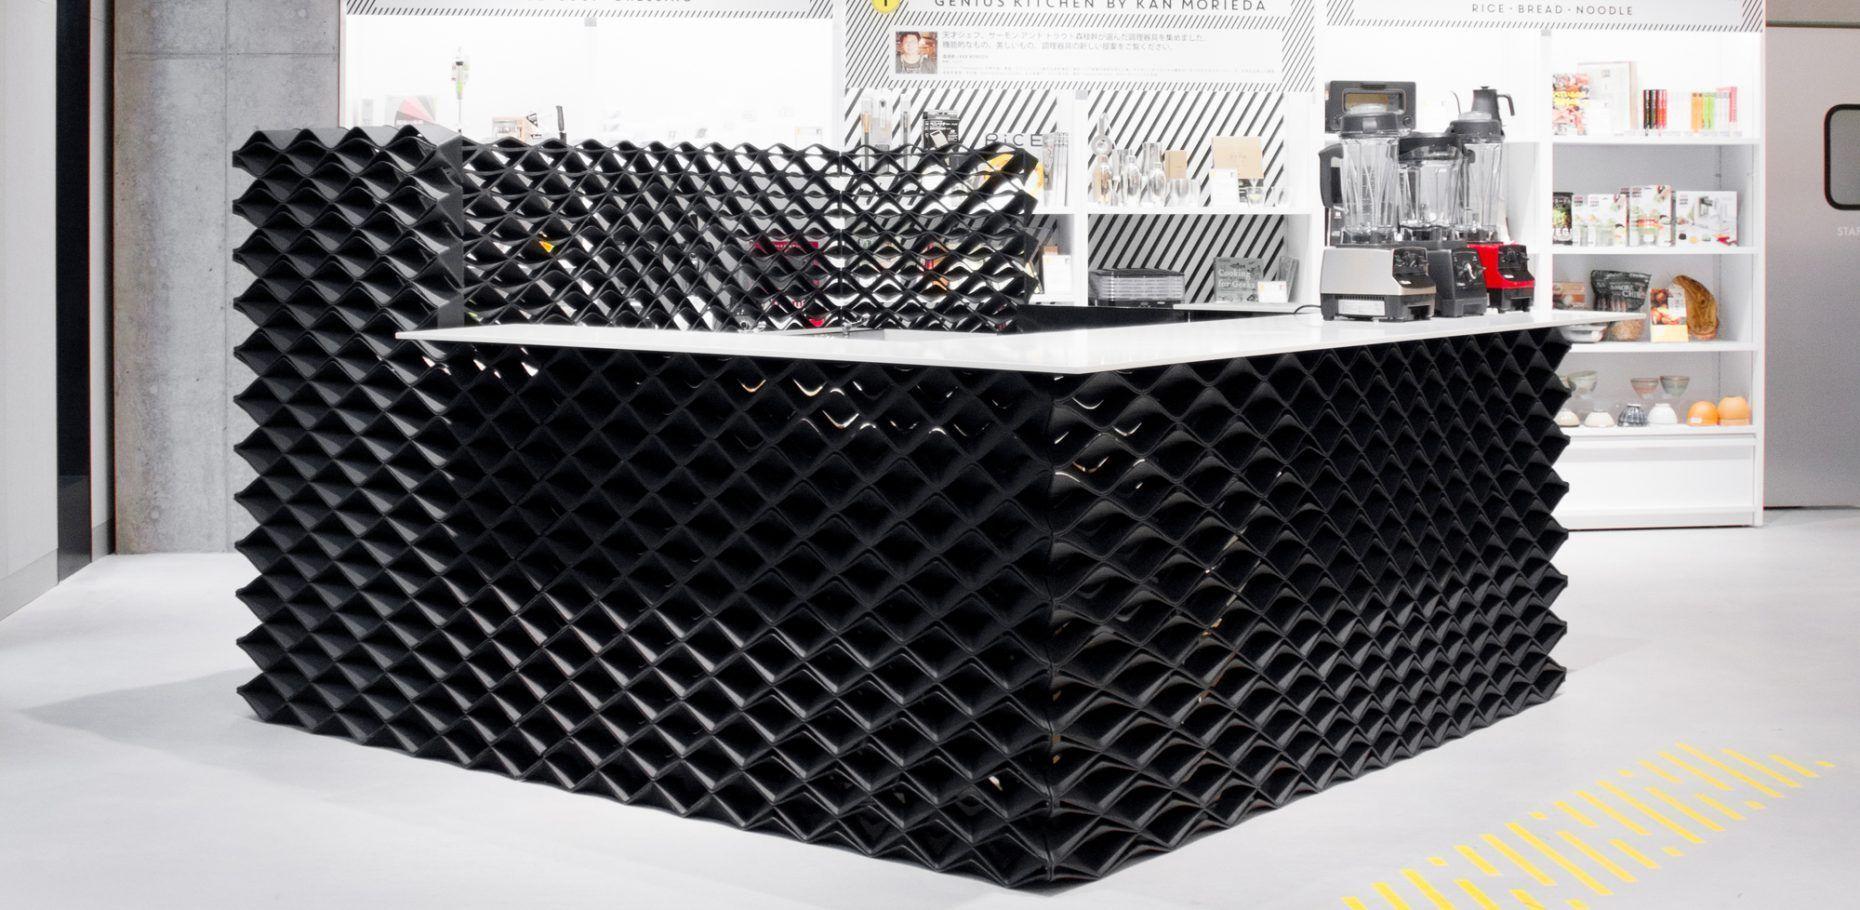 Digital Technologies - Retail - 3D printing